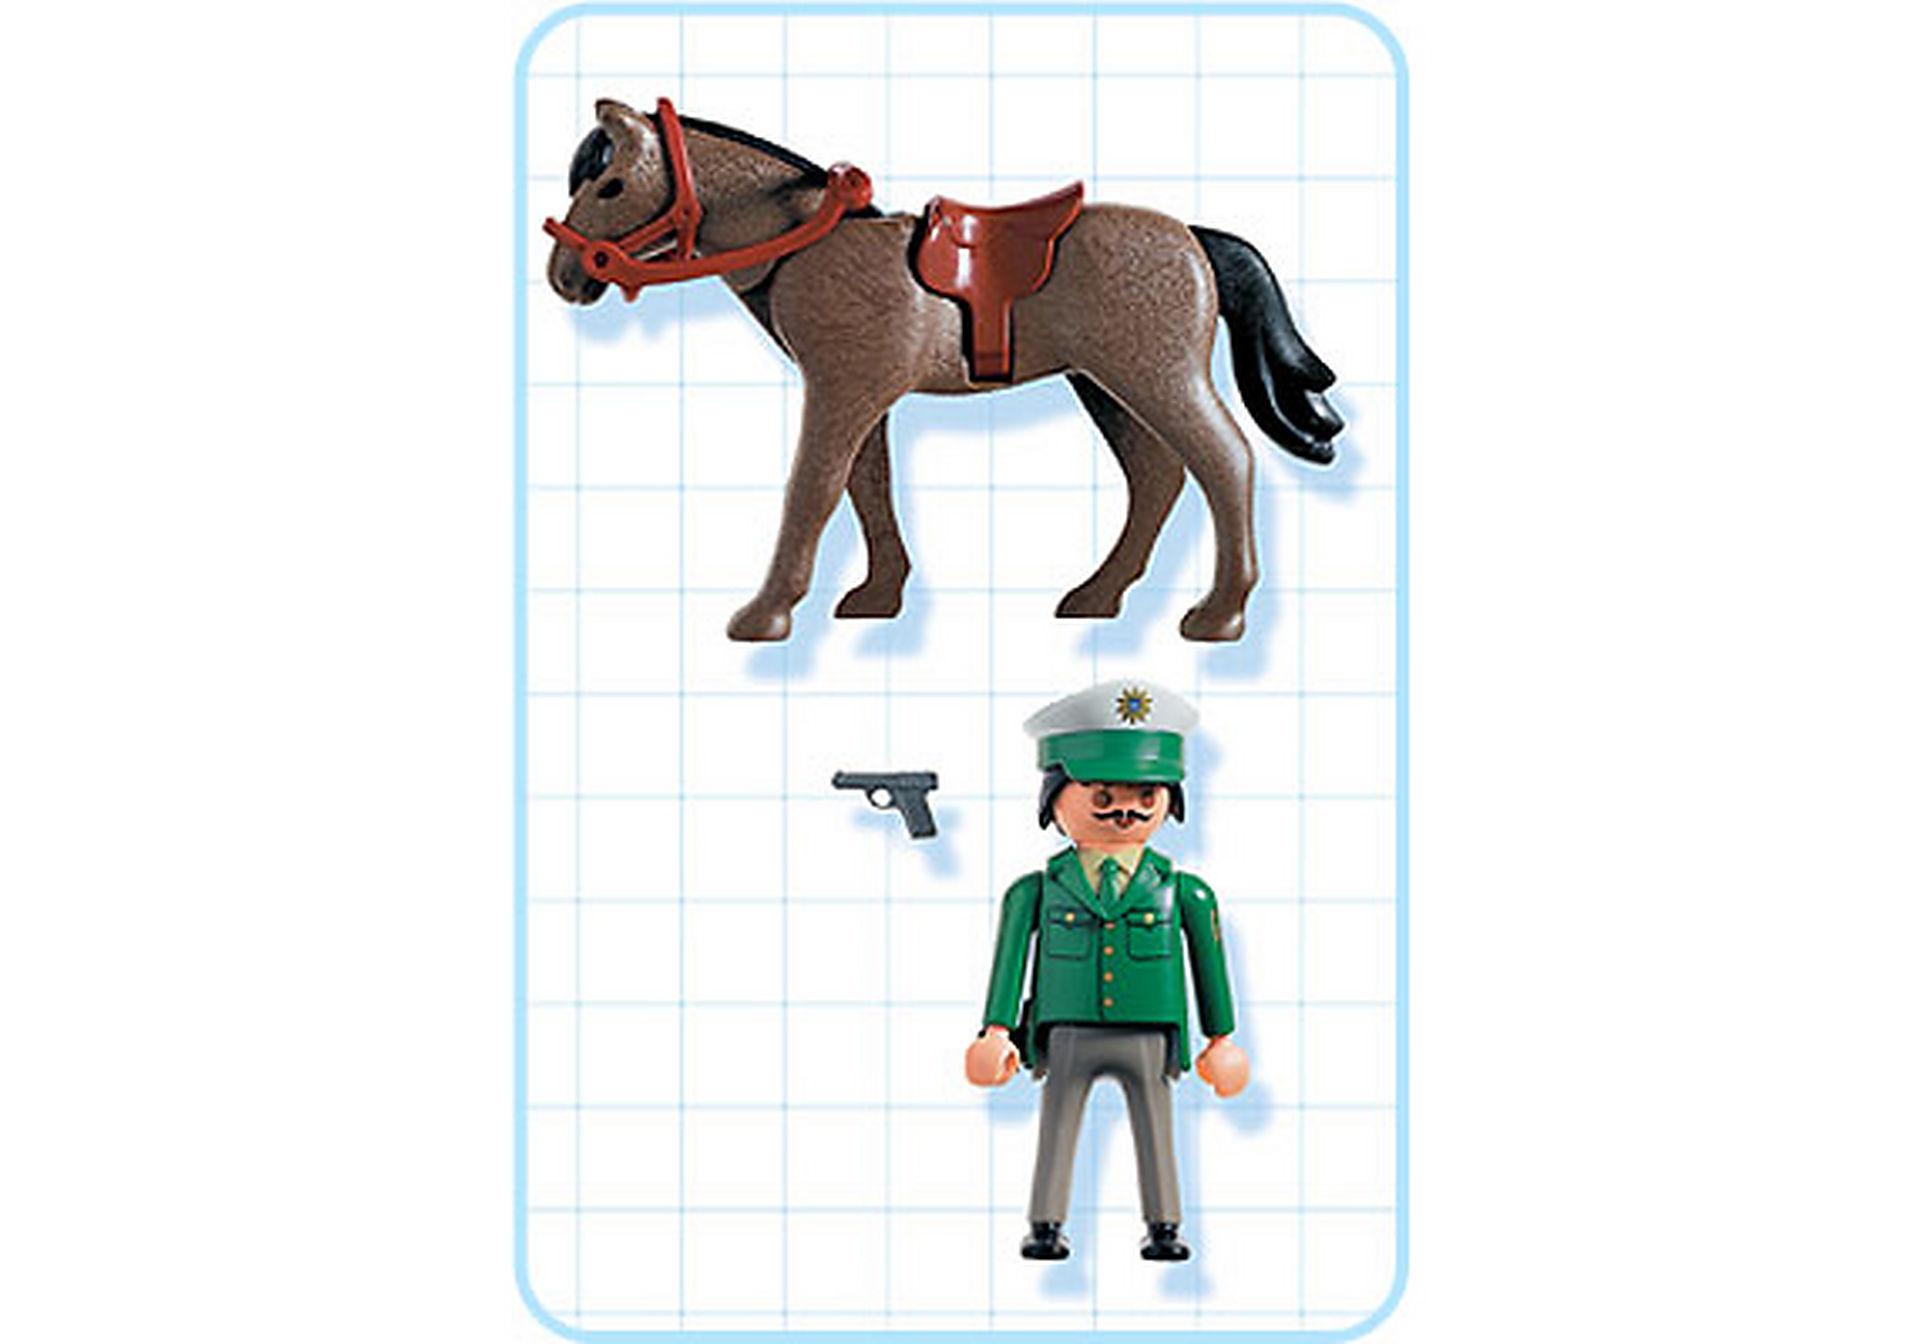 3163-A Polizist/Pferd zoom image2